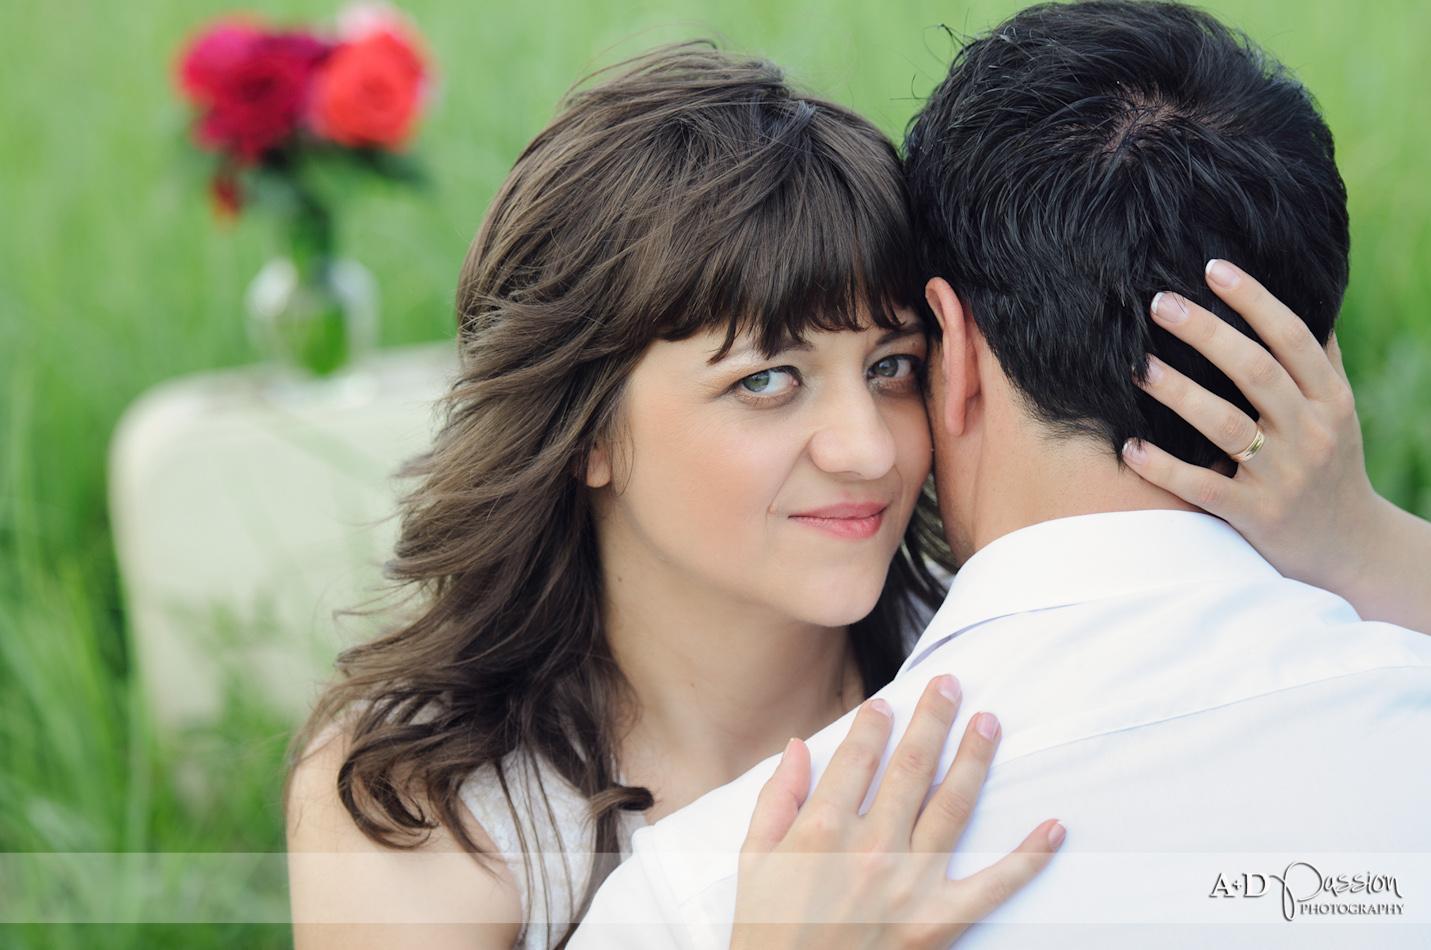 AD Passion Photography | 07042012_fotograf-profesionist-nunta_after-wedding_carmen-si-costi_0041 | Adelin, Dida, fotograf profesionist, fotograf de nunta, fotografie de nunta, fotograf Timisoara, fotograf Craiova, fotograf Bucuresti, fotograf Arad, nunta Timisoara, nunta Arad, nunta Bucuresti, nunta Craiova